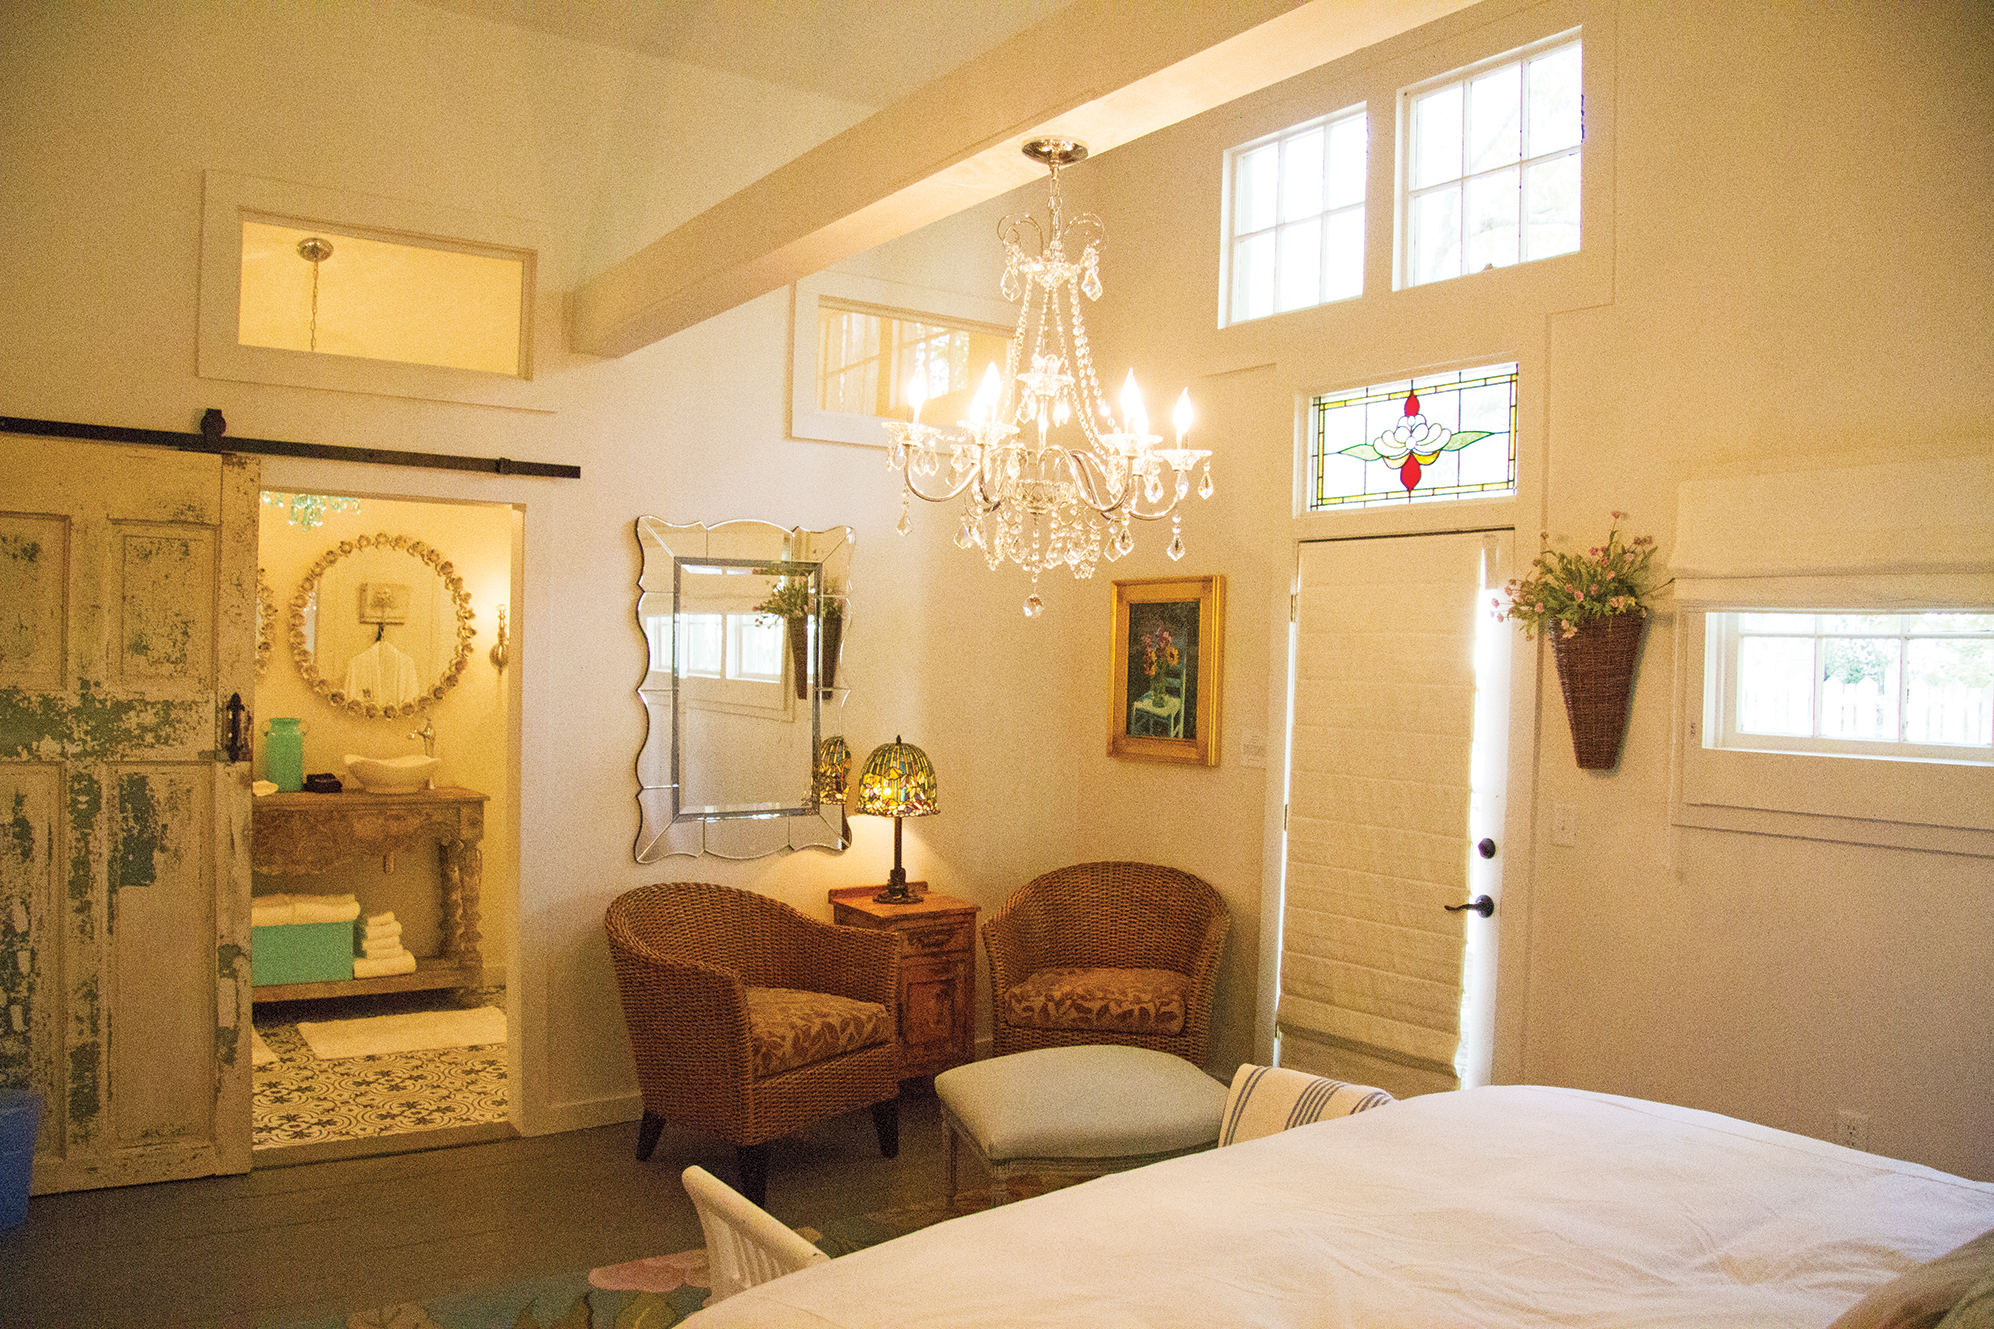 ROOM 10 - GARDEN ROOM - KING BED wiih LARGE WALK-IN SHOWER